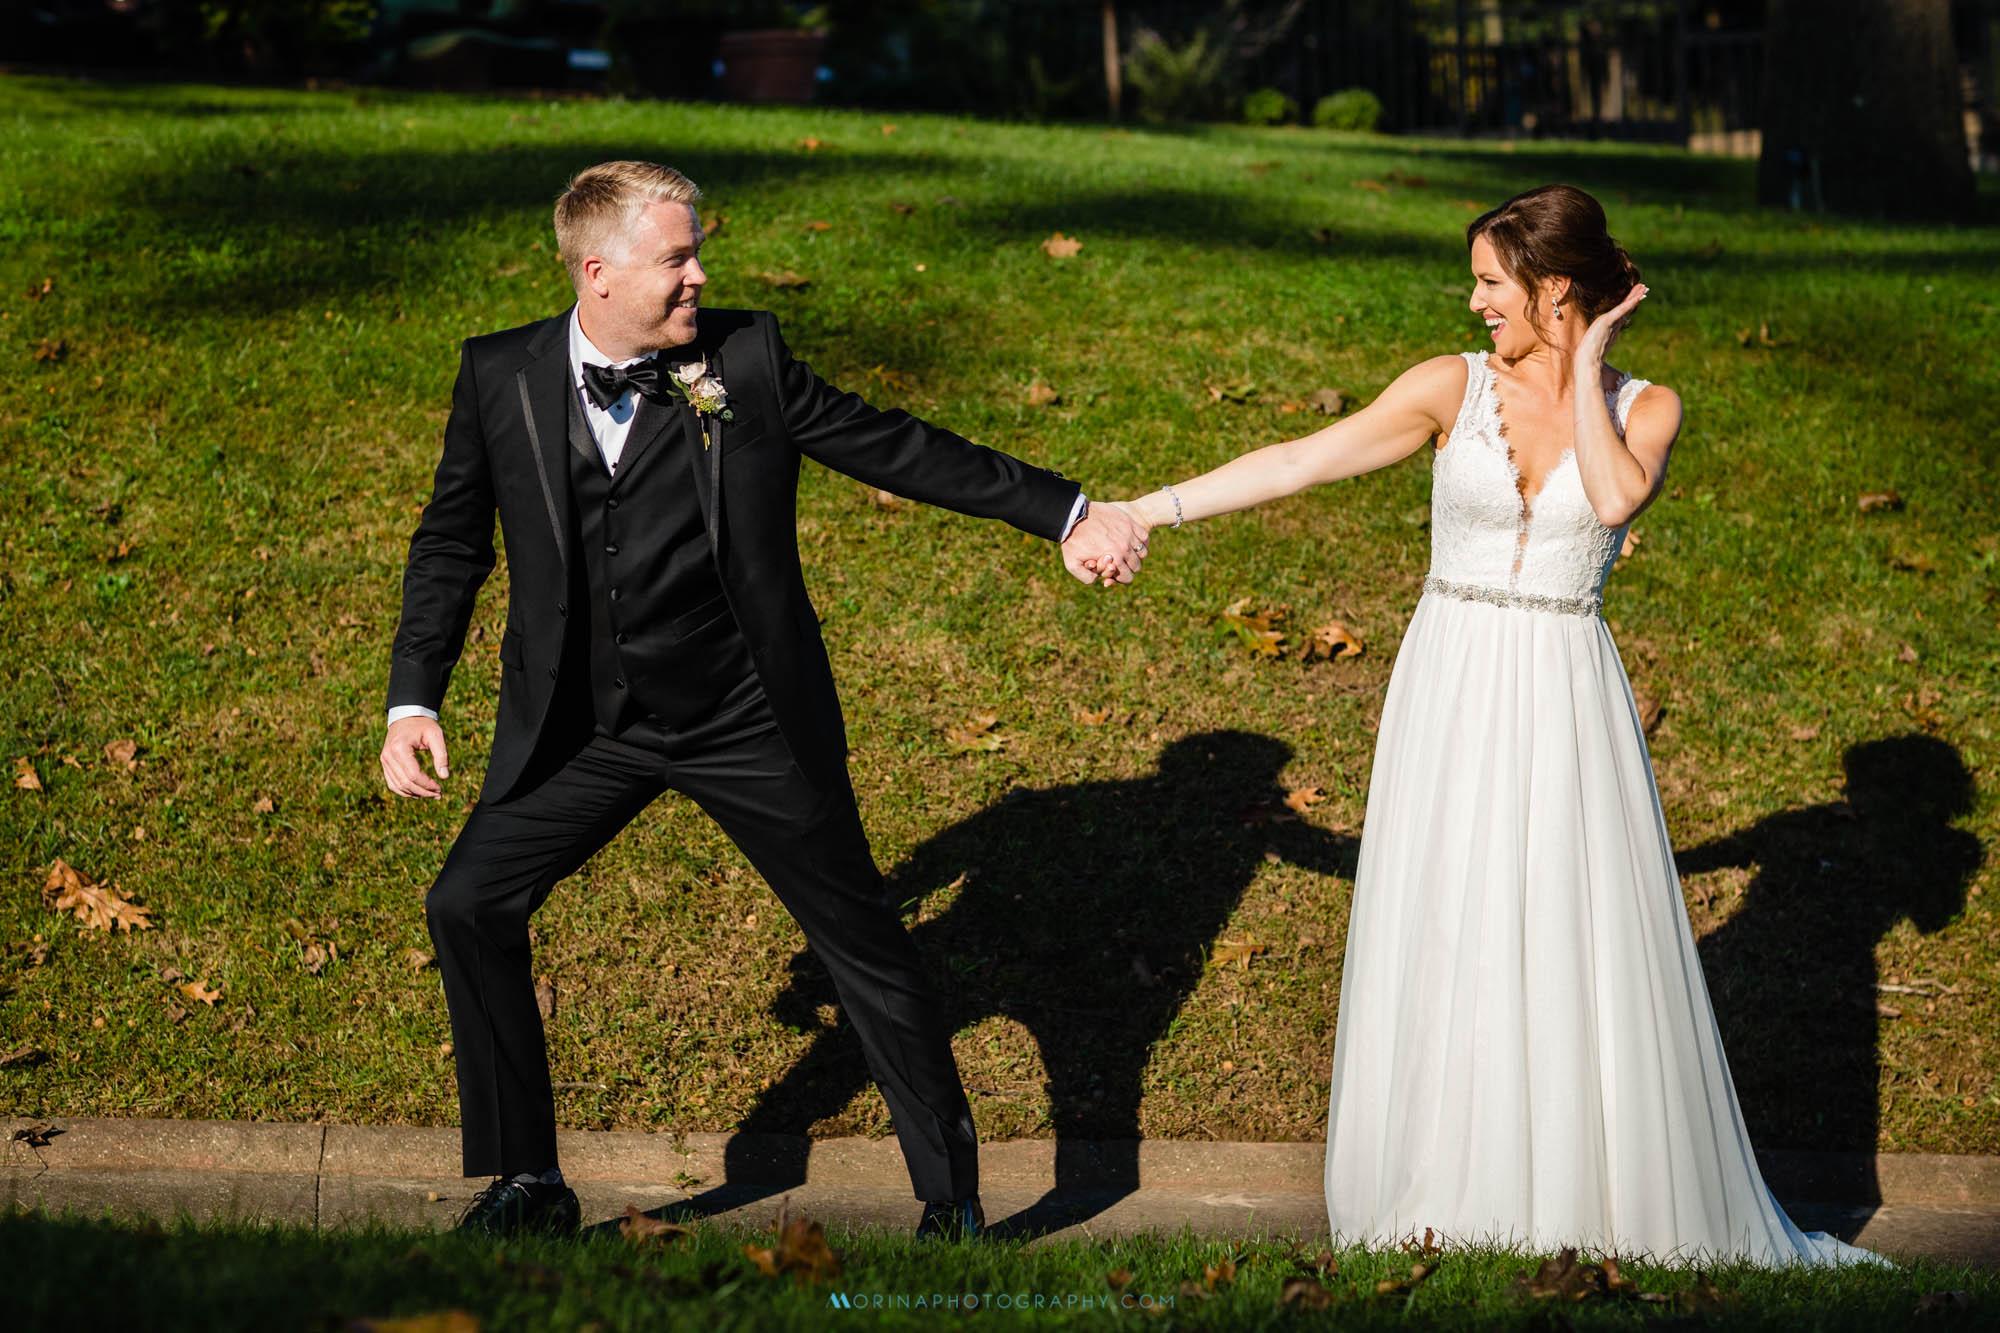 Colleen & Bill Wedding at Manufacturers' Golf & Country Club wedding 0058.jpg